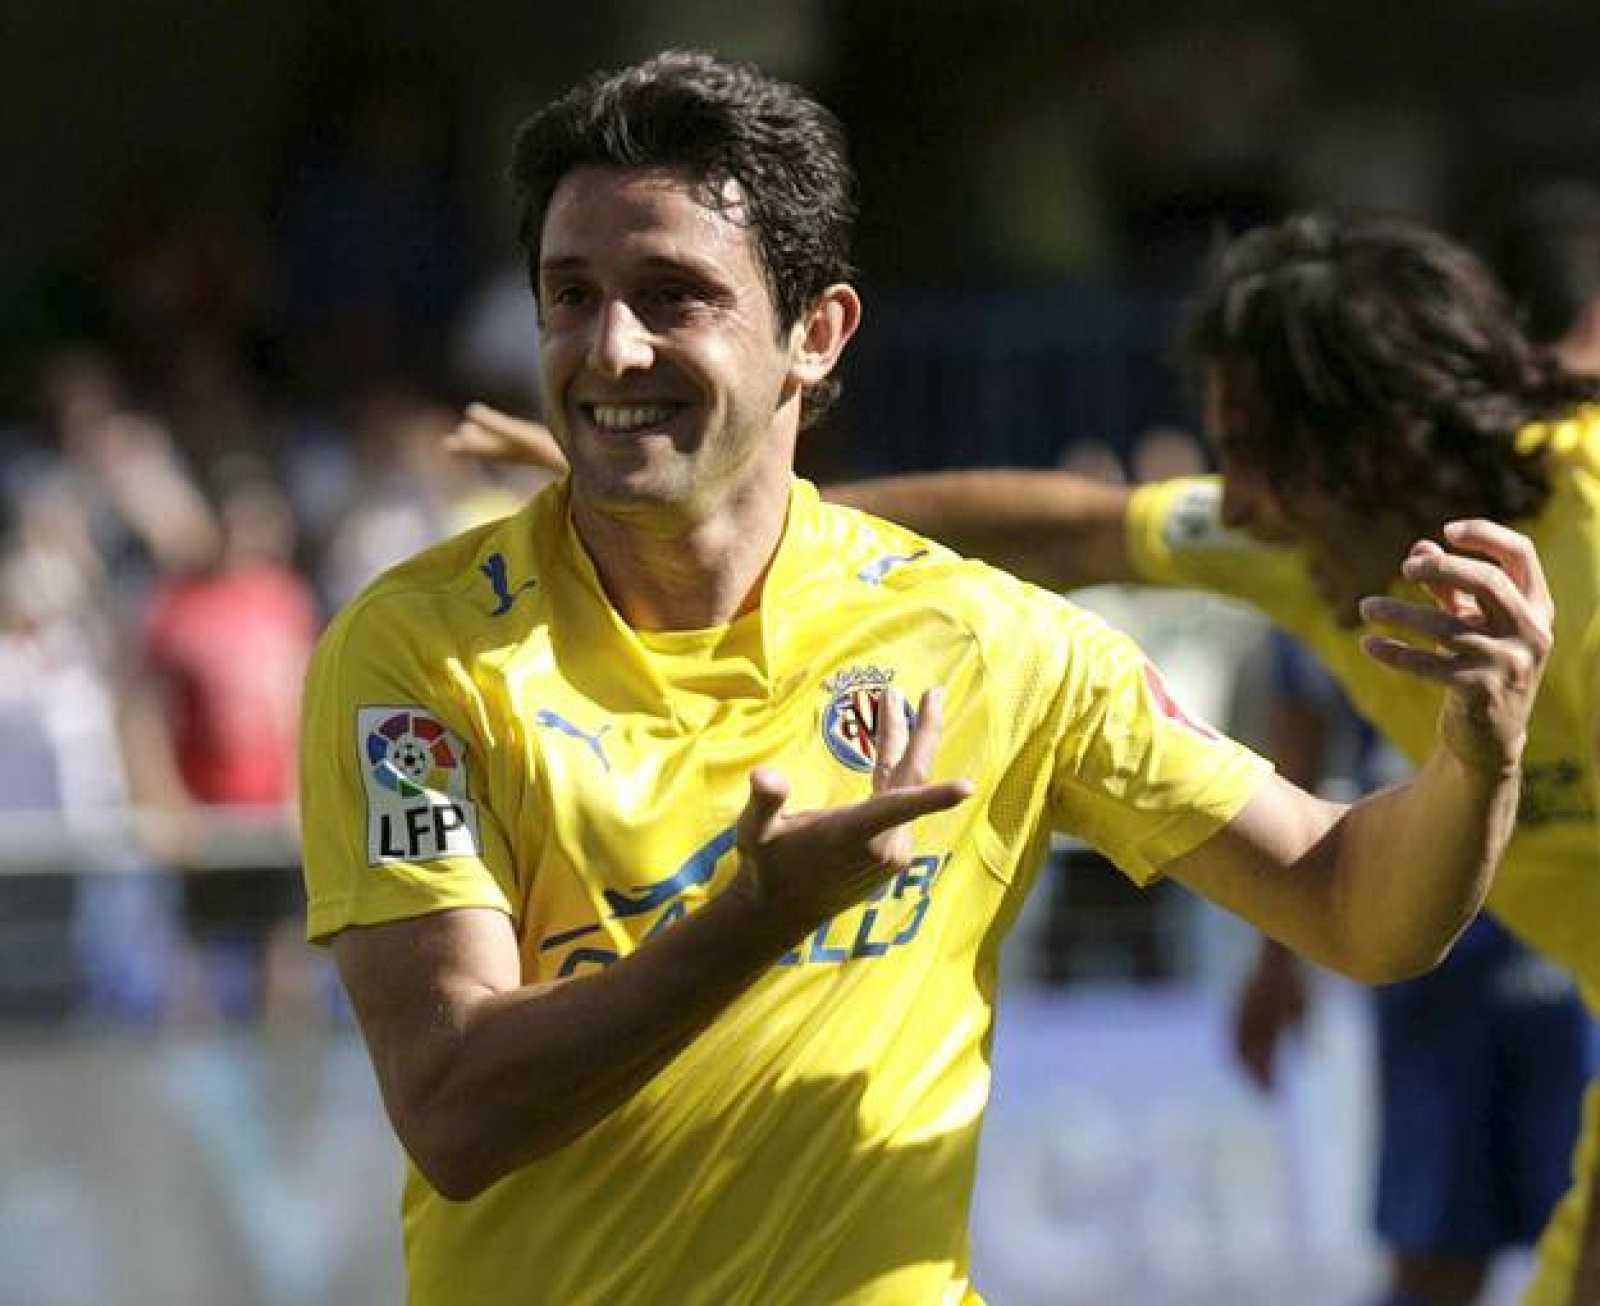 El delantero del Villarreal, Nihat Kahveci, ha anotado dos goles ante el Getafe.